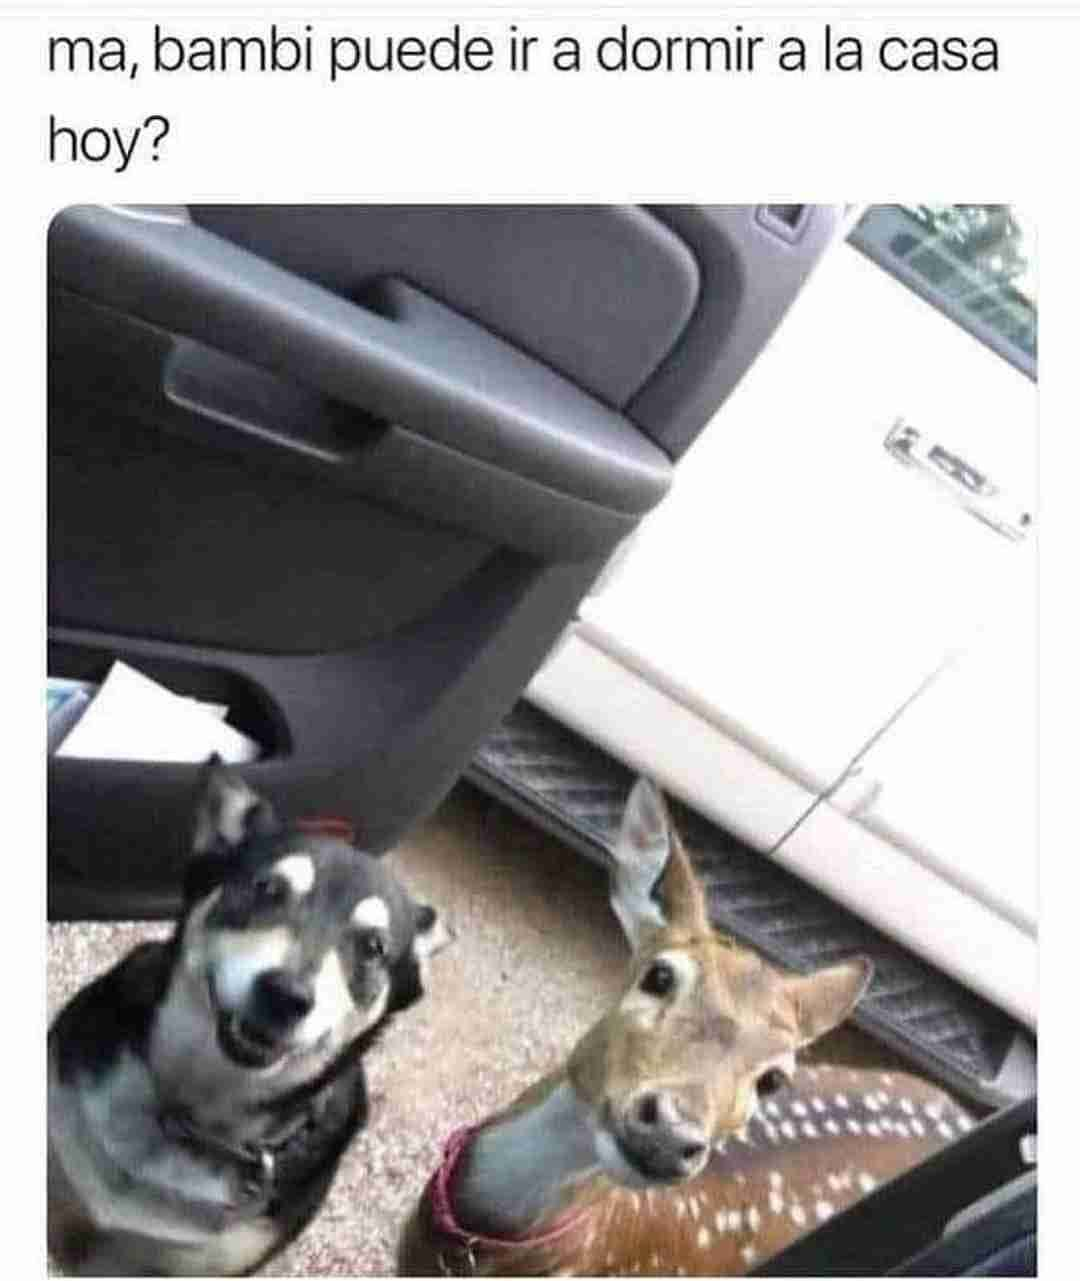 Ma, bambi puede ir a dormir a la casa hoy?